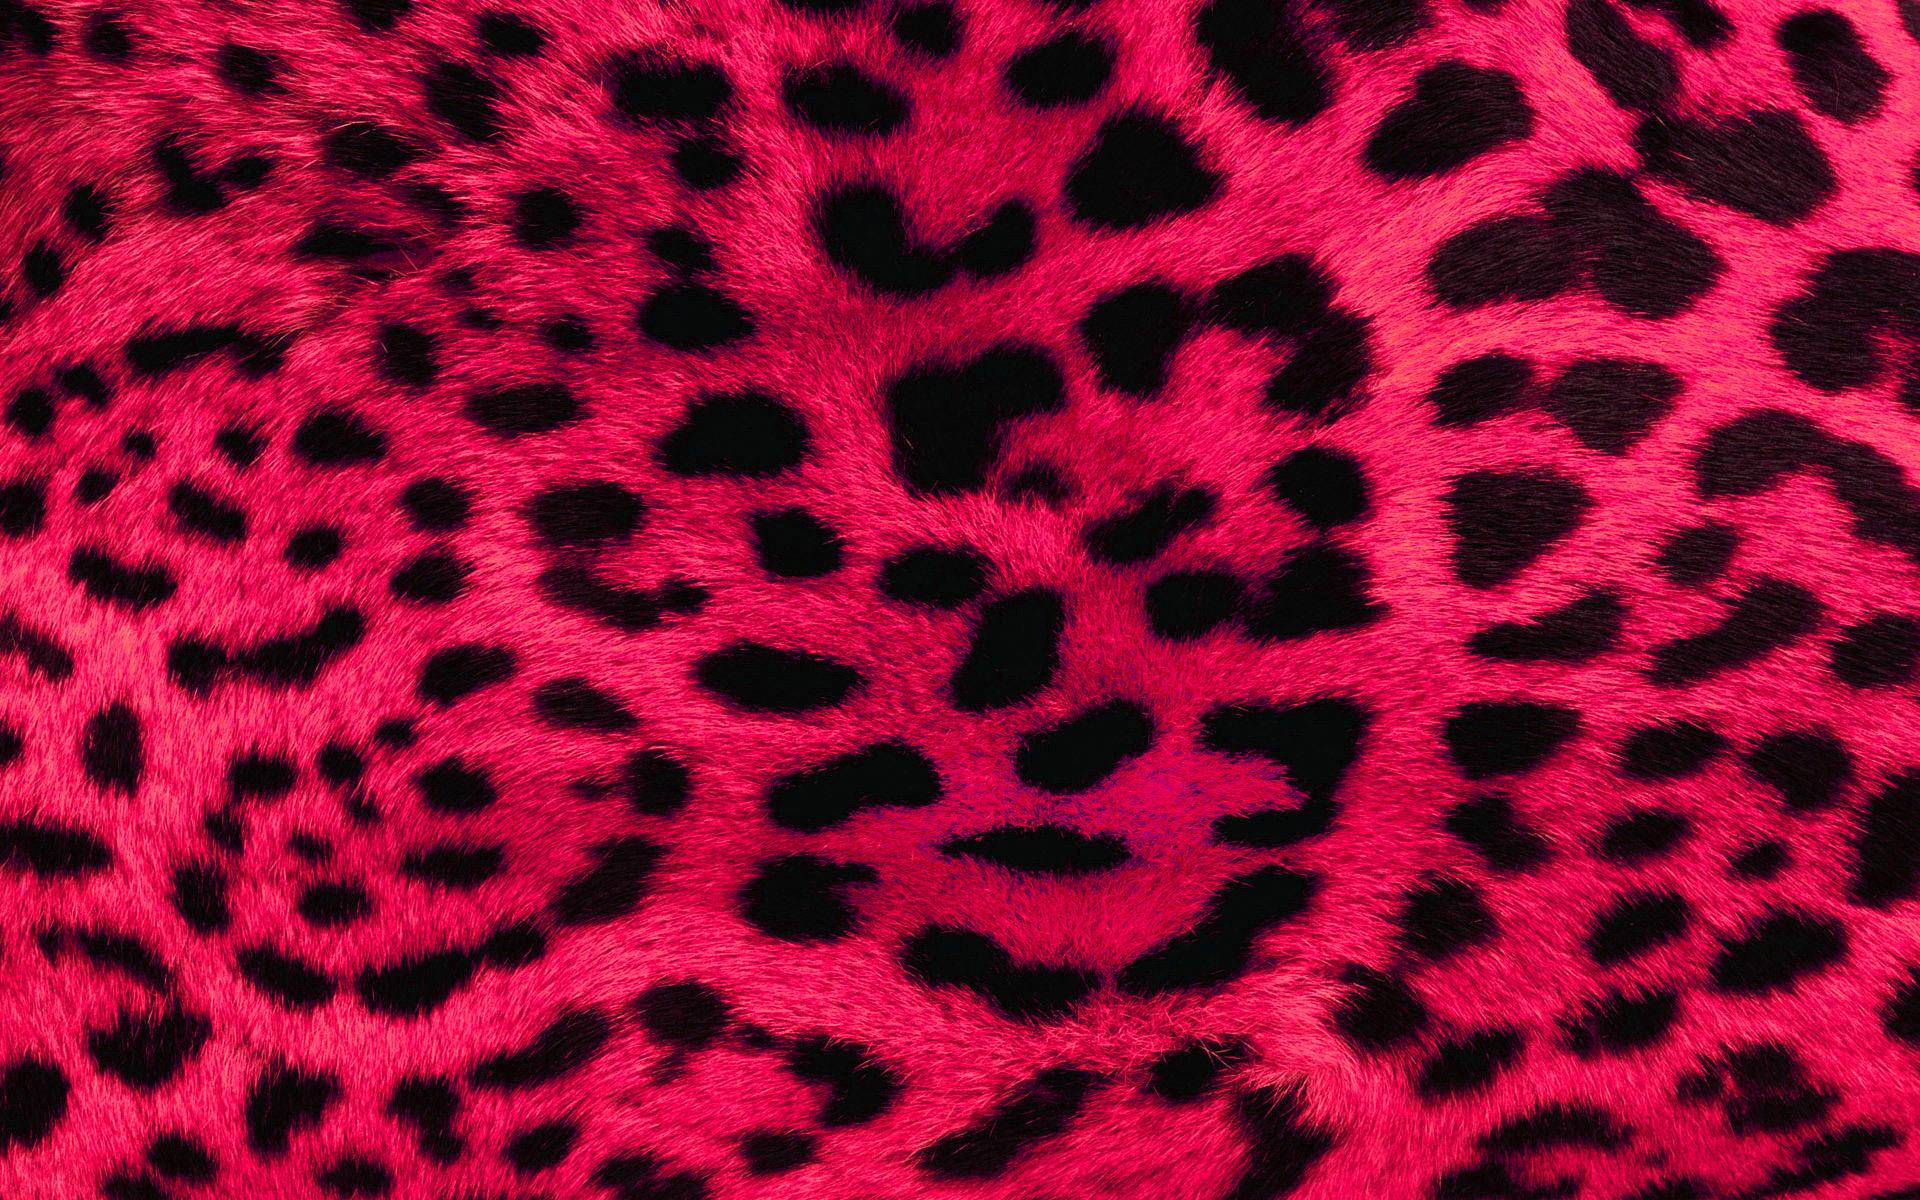 Leopard Wallpaper for Bedroom wallpaper Leopard Wallpaper for 1920x1200